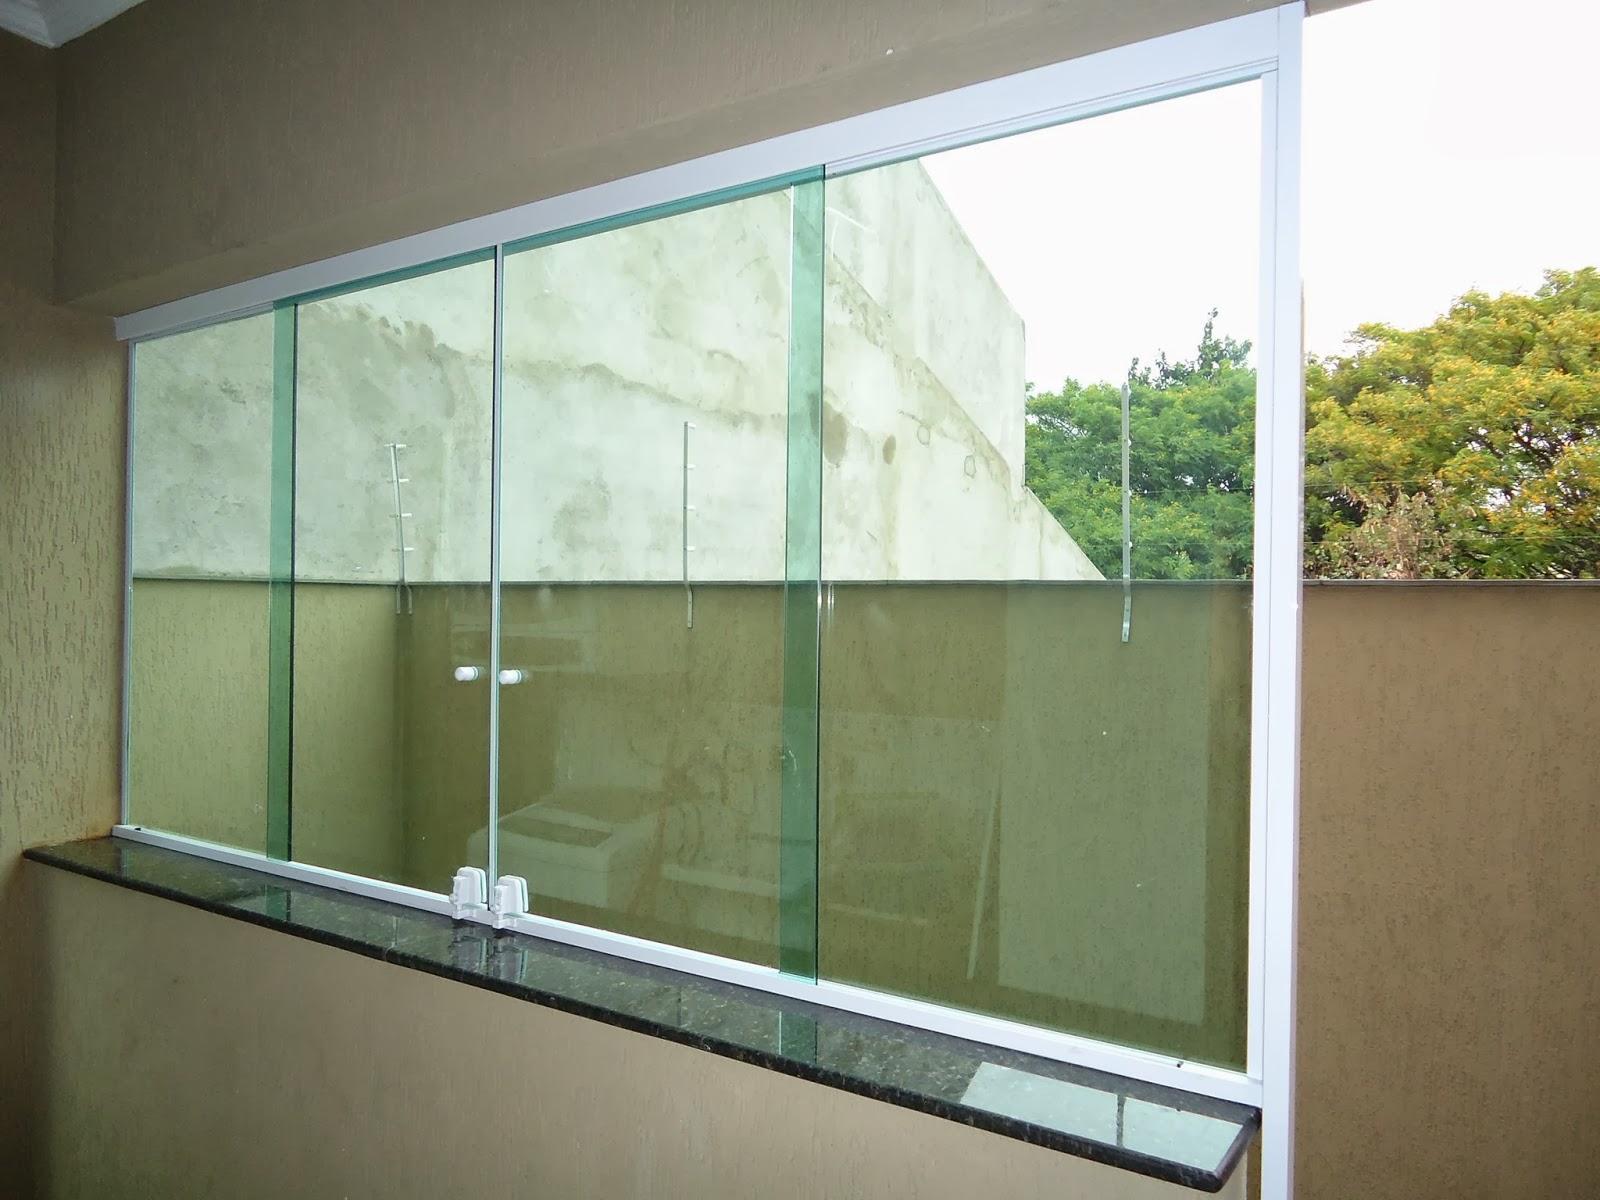 #818447 IC Vidros Design: Janelas e fechamento de Área e Varanda 446 Janelas De Vidros Temperados  Rj